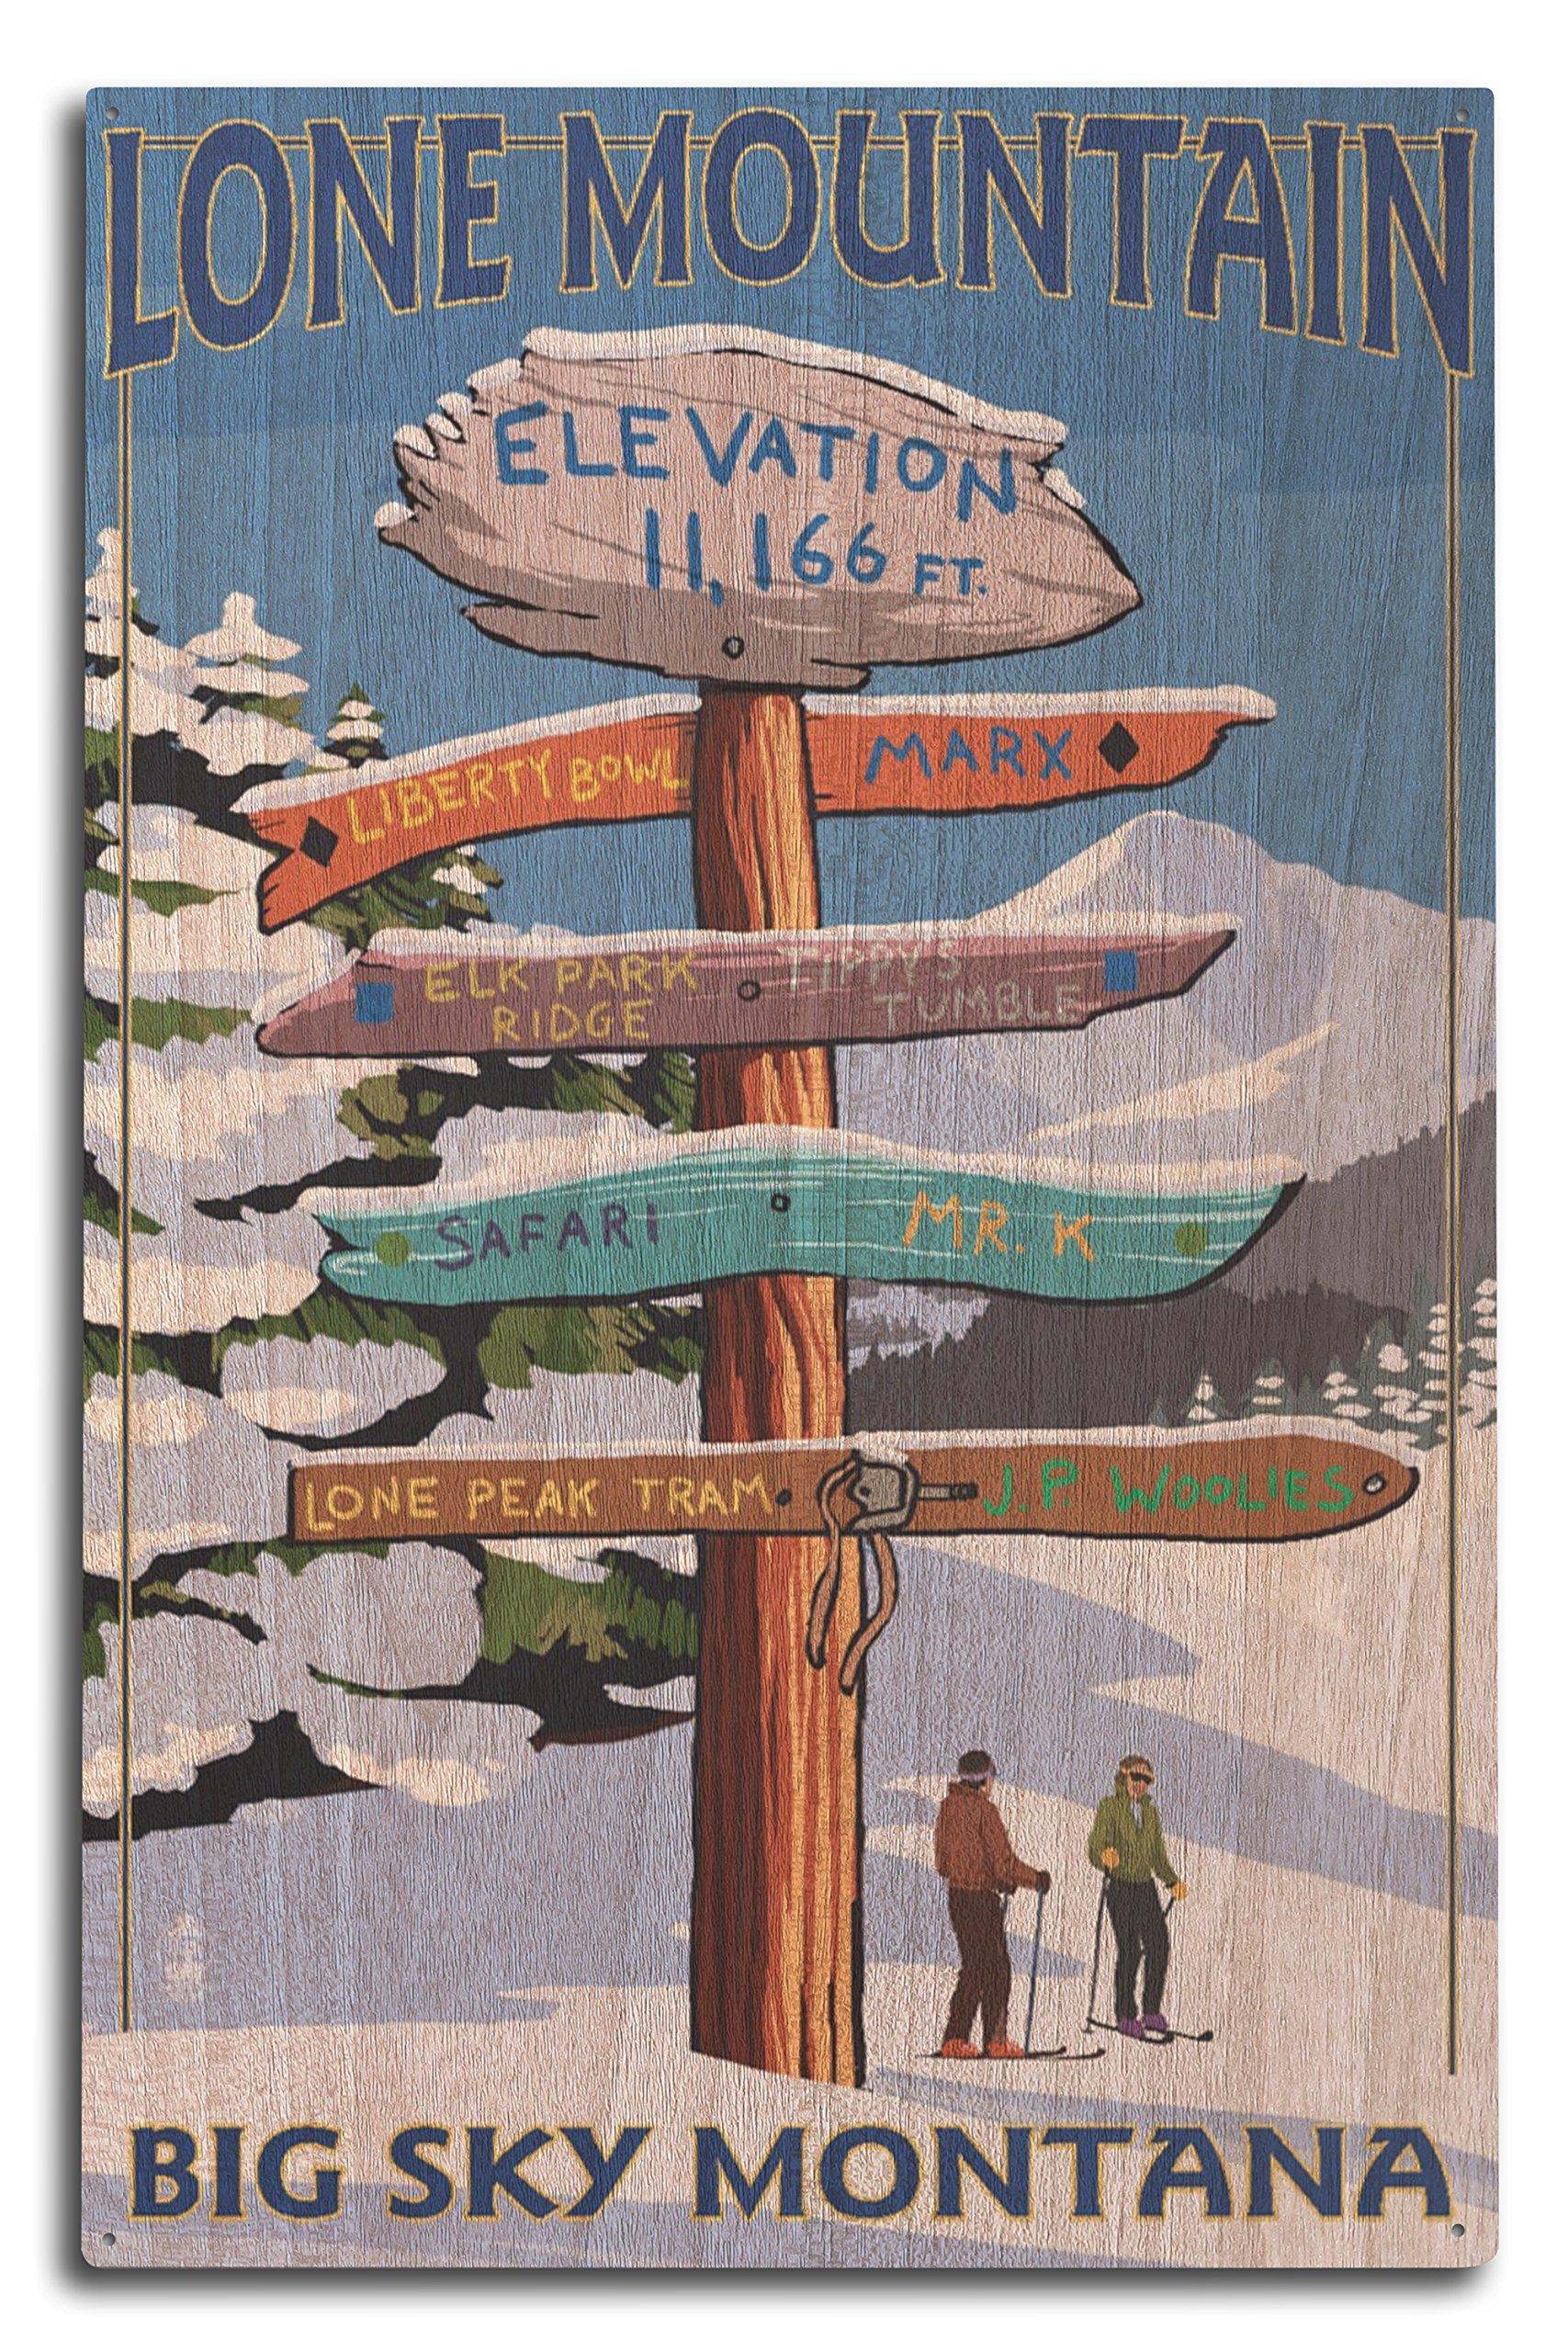 Lantern Press Big Sky, Montana - Lone Mountain - Ski Destinations Sign (10x15 Wood Wall Sign, Wall Decor Ready to Hang)